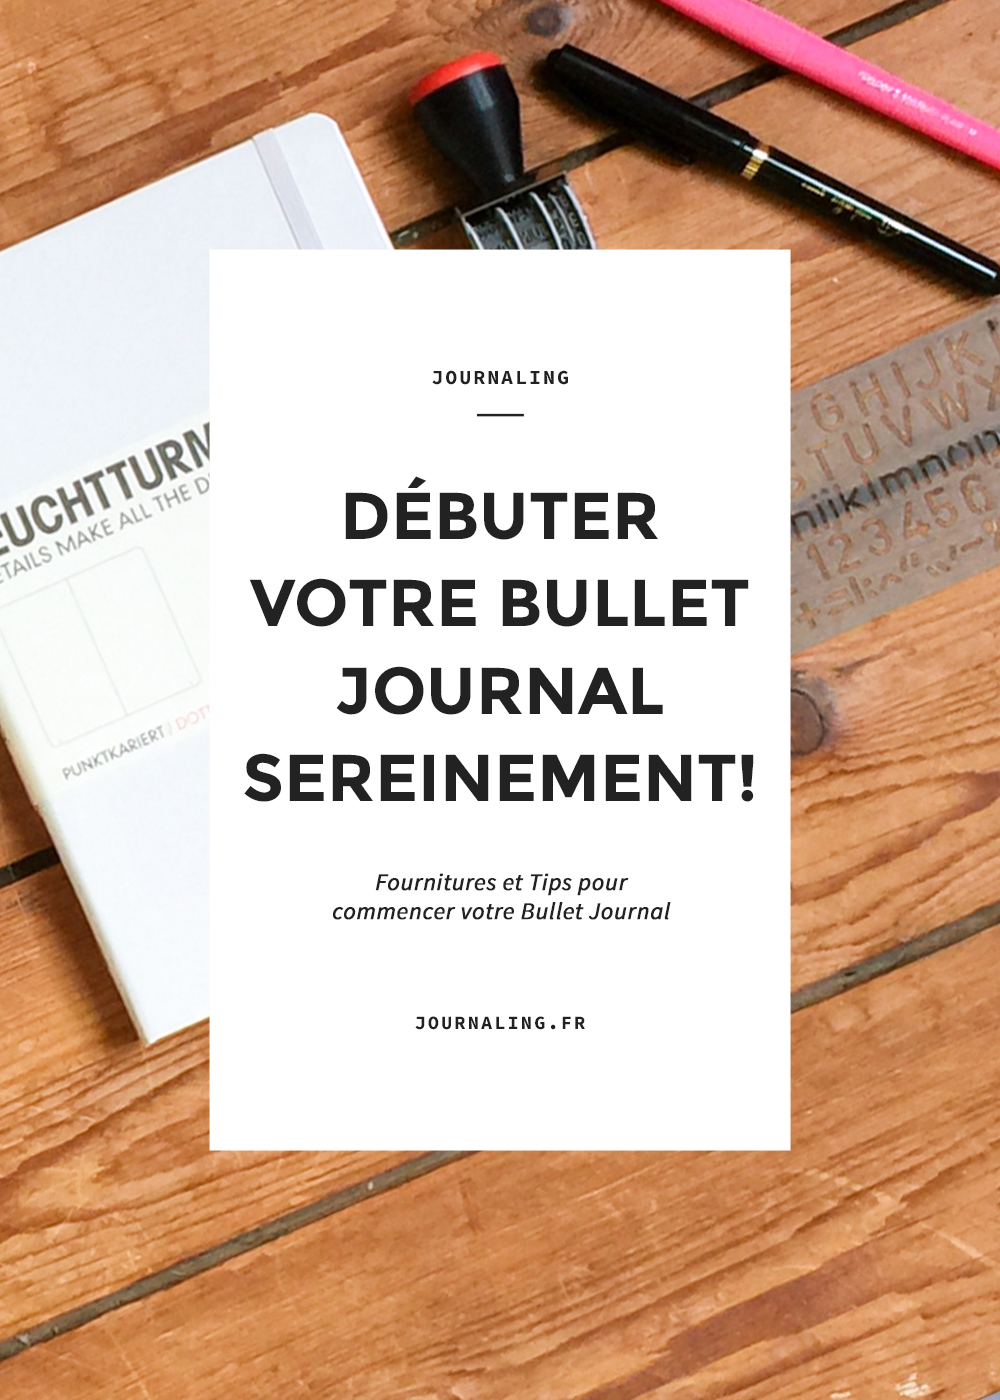 Commencer un Bullet Journal: fournitures et tips indispensables